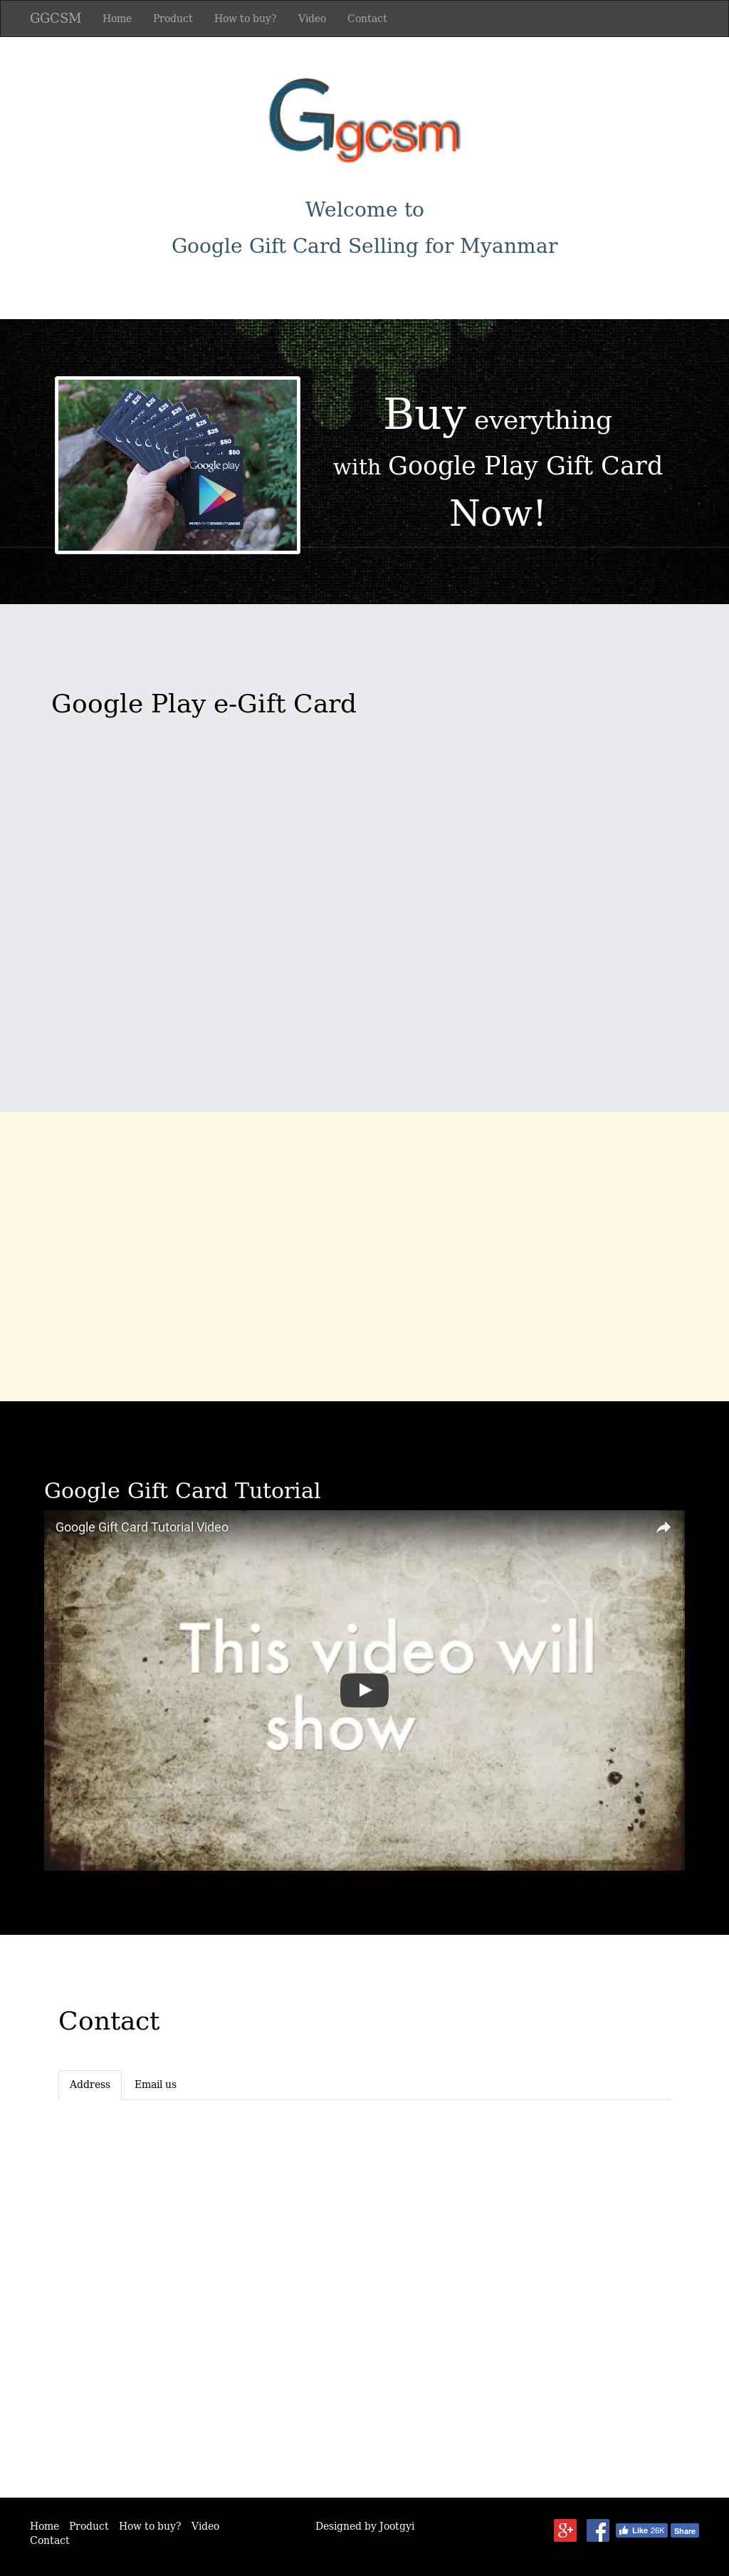 Google Gift Card Selling For Myanmar Competitors Revenue And 50 Play Us Myanmars Website Screenshot On Jul 2017